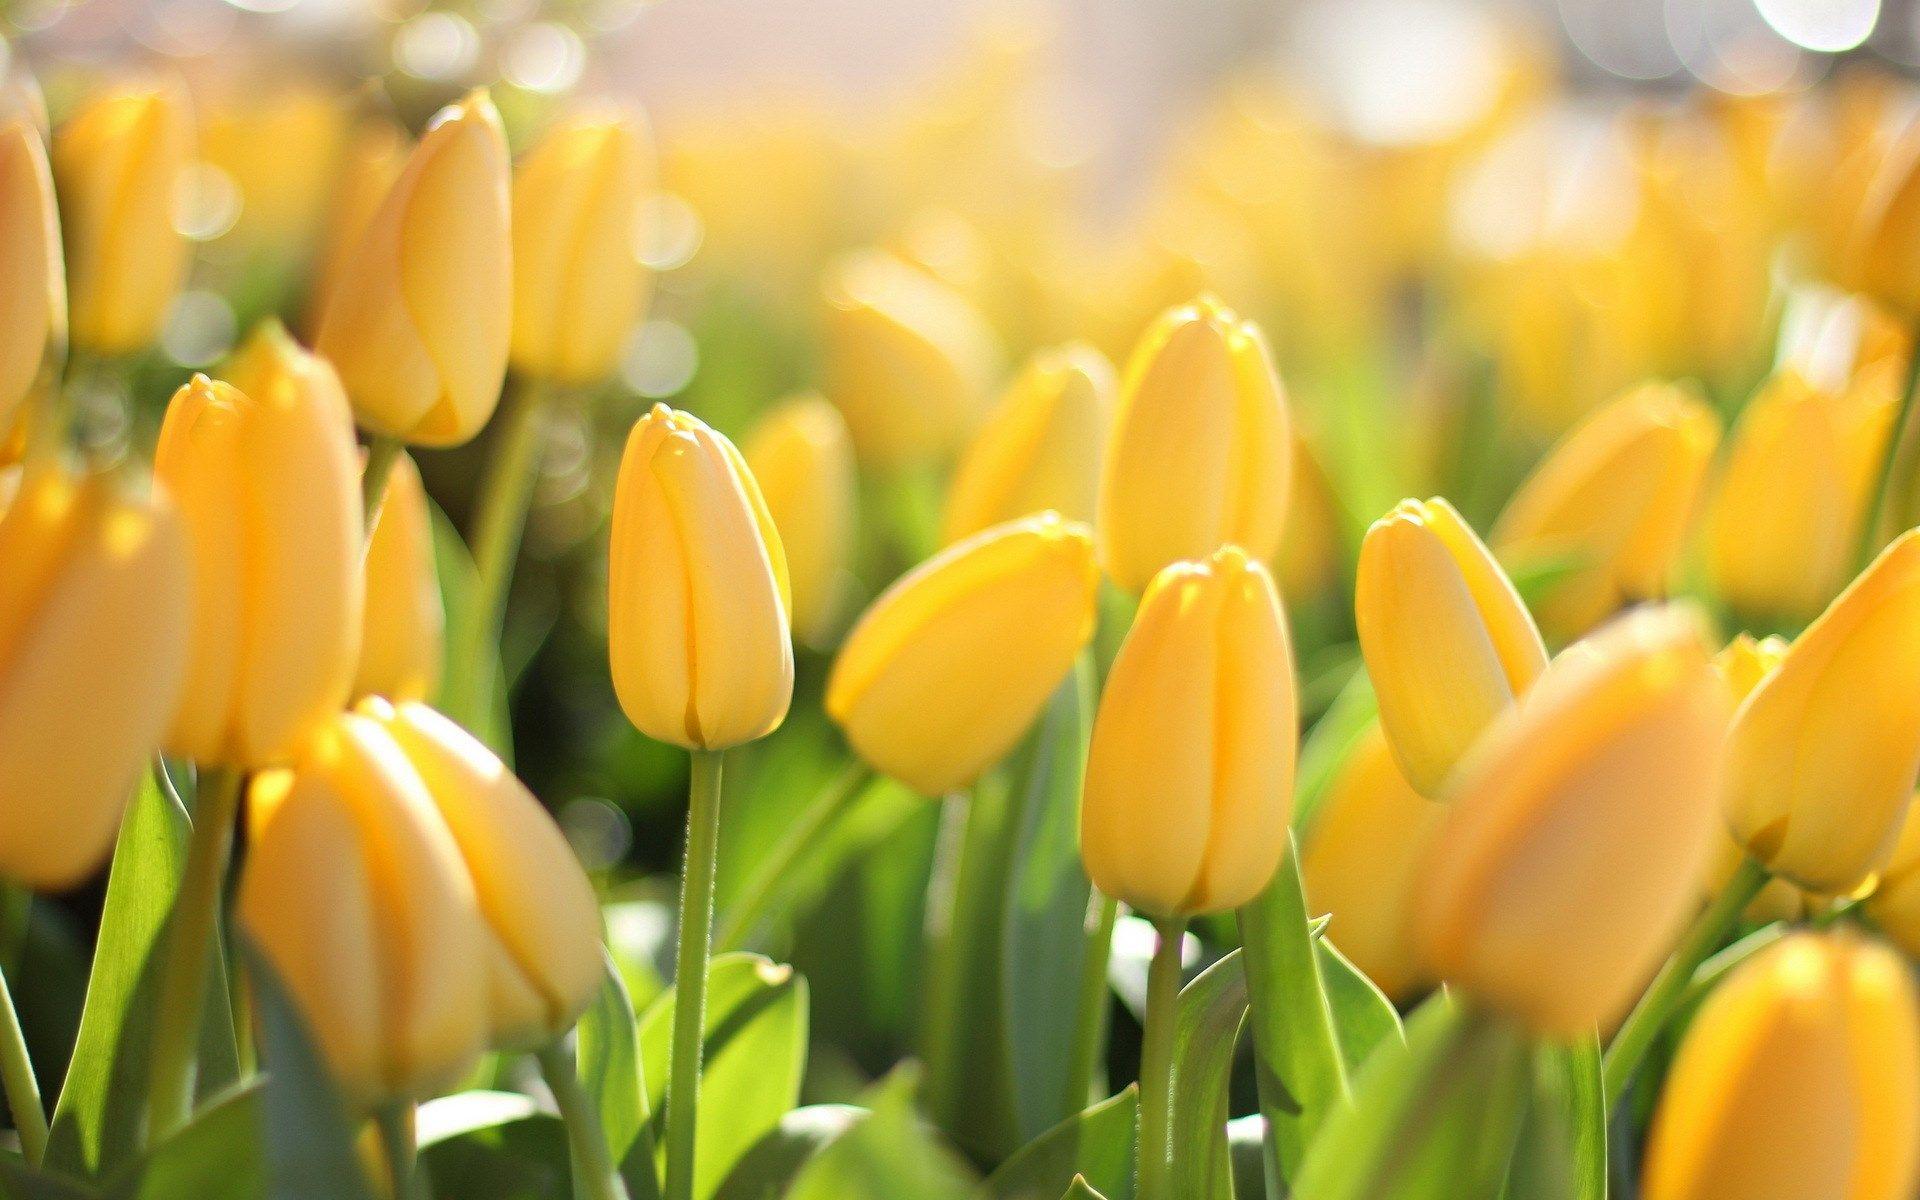 macro field of yellow tulips flowers closeup lights bokeh